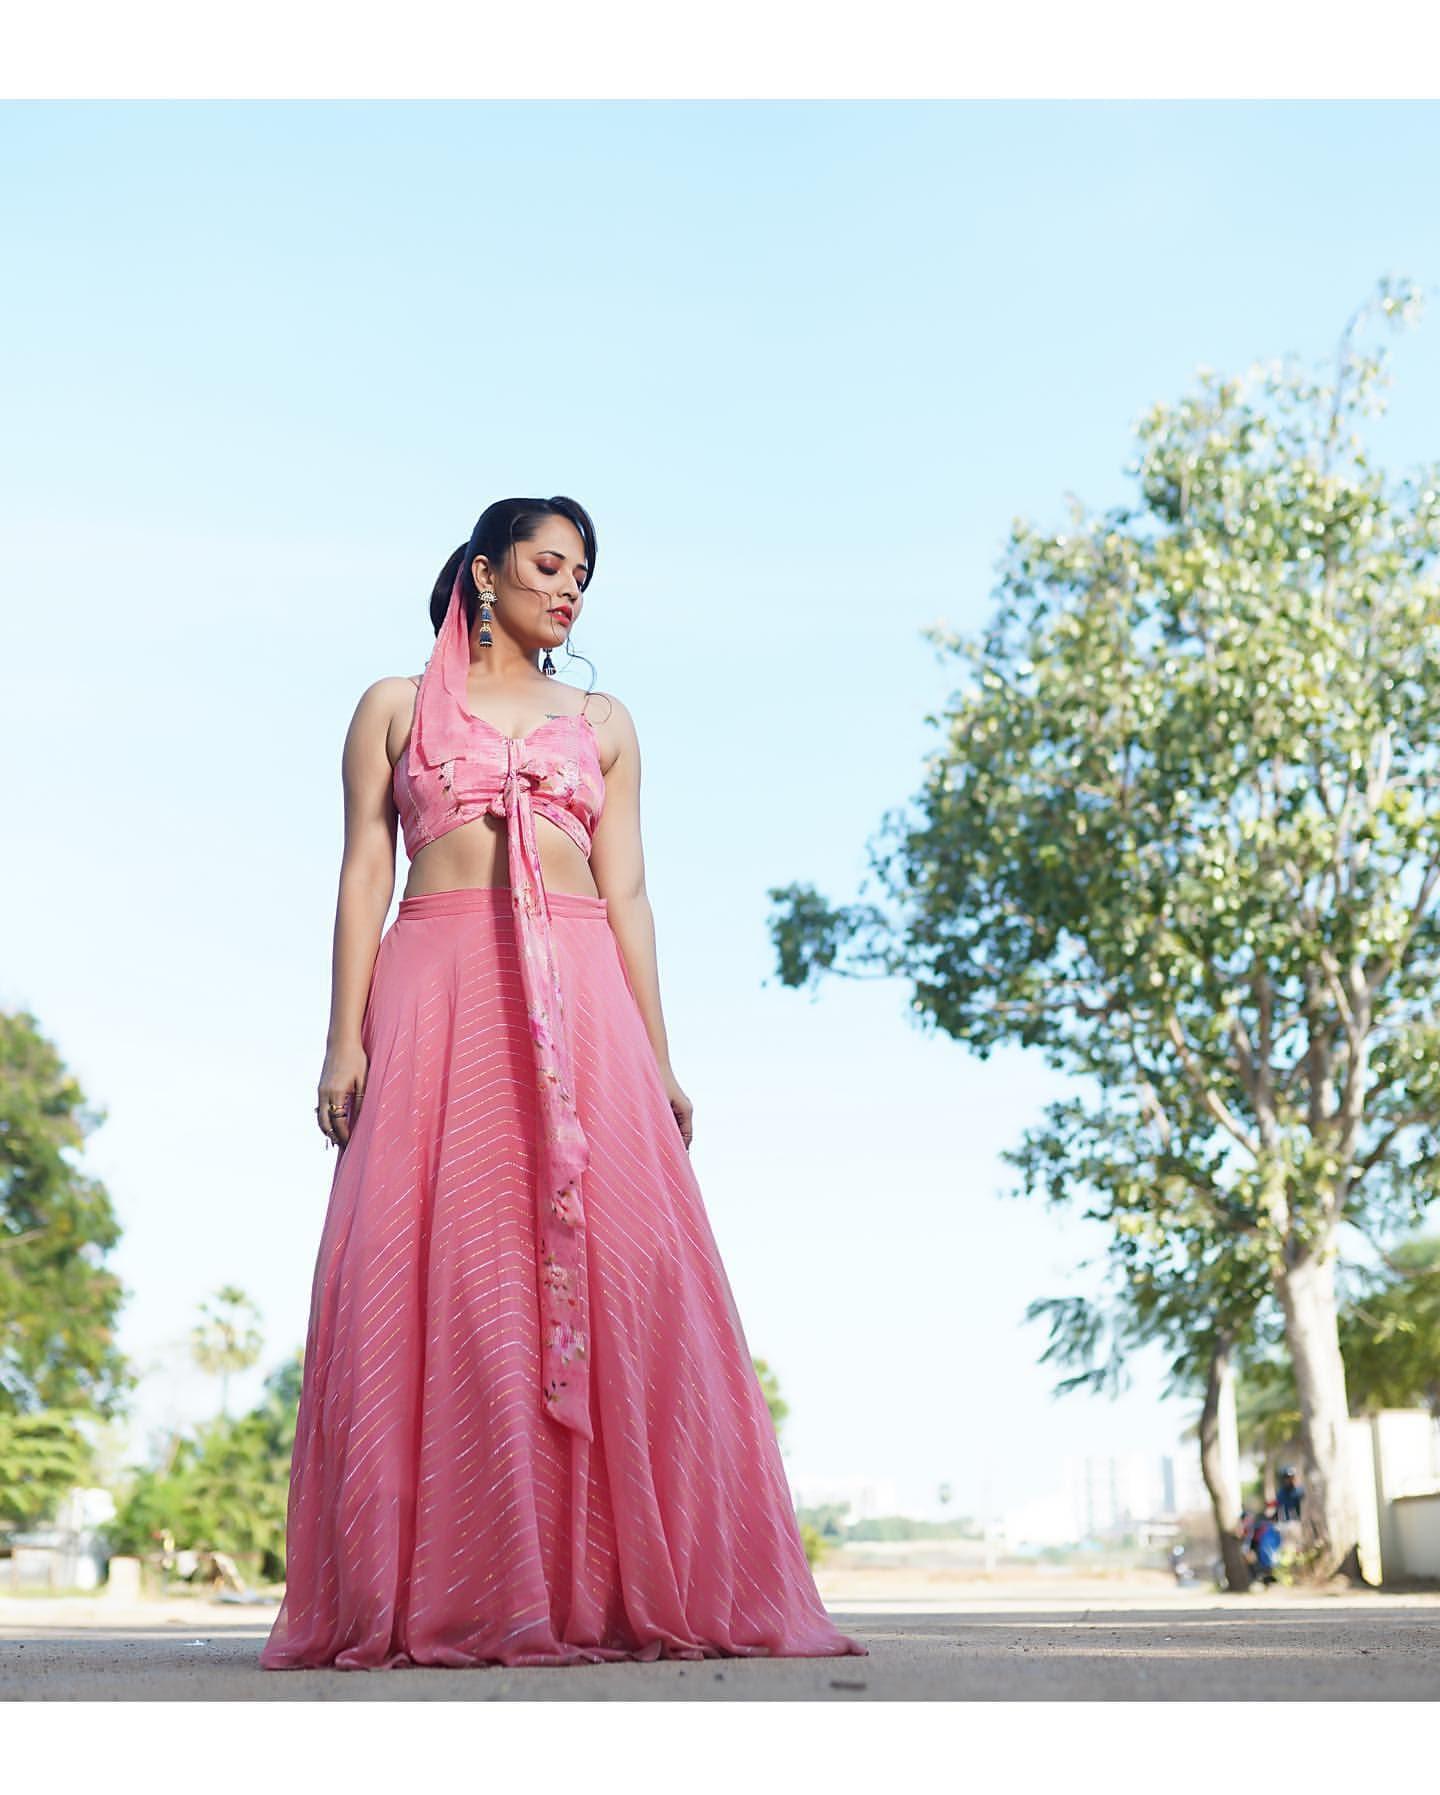 Anasuya Bharadwaj : అనసూయ.. ఈ పేరు తెలియని తెలుగు టీవీ ప్రేక్షకులు ఉండరంటే అతిశయోక్తి కాదు. అంతలా ఆమె 'జబర్దస్త్' షో ద్వారా తెలుగువారికి దగ్గరైంది. Instagram